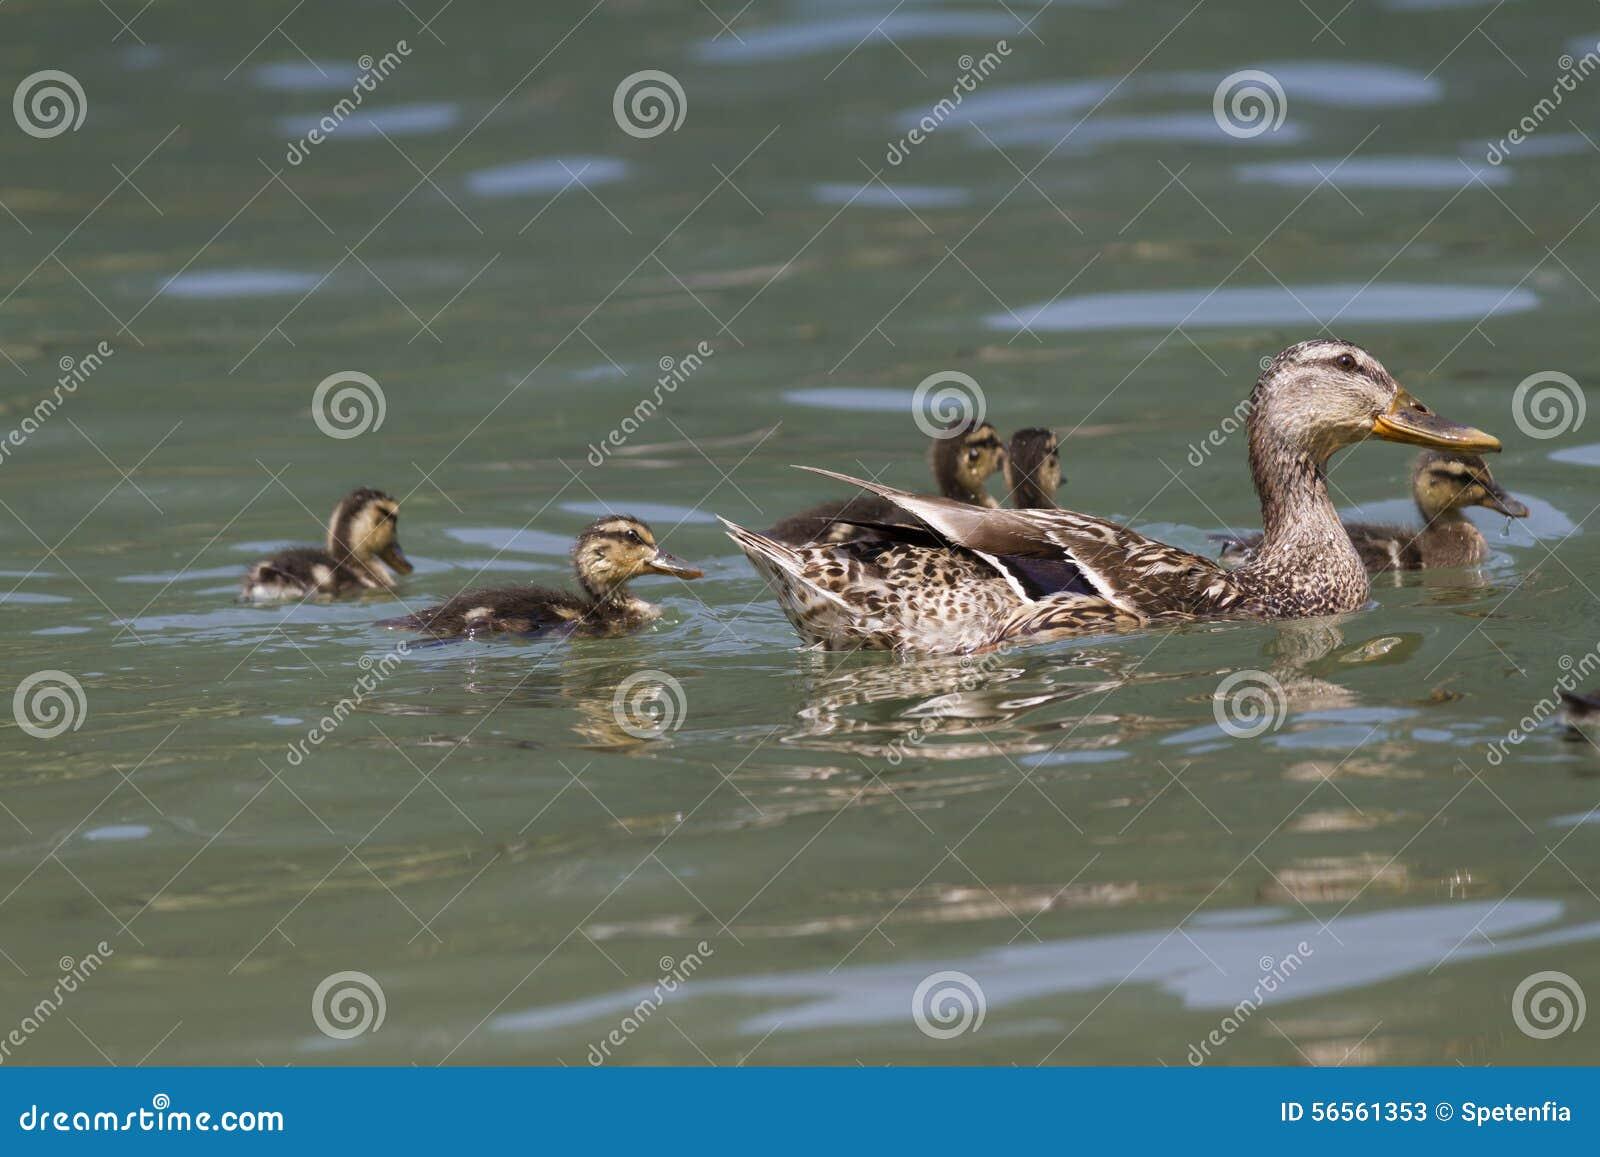 Download Πάπια με τους νεοσσούς στη λίμνη Στοκ Εικόνα - εικόνα από αγρόκτημα, χήνα: 56561353